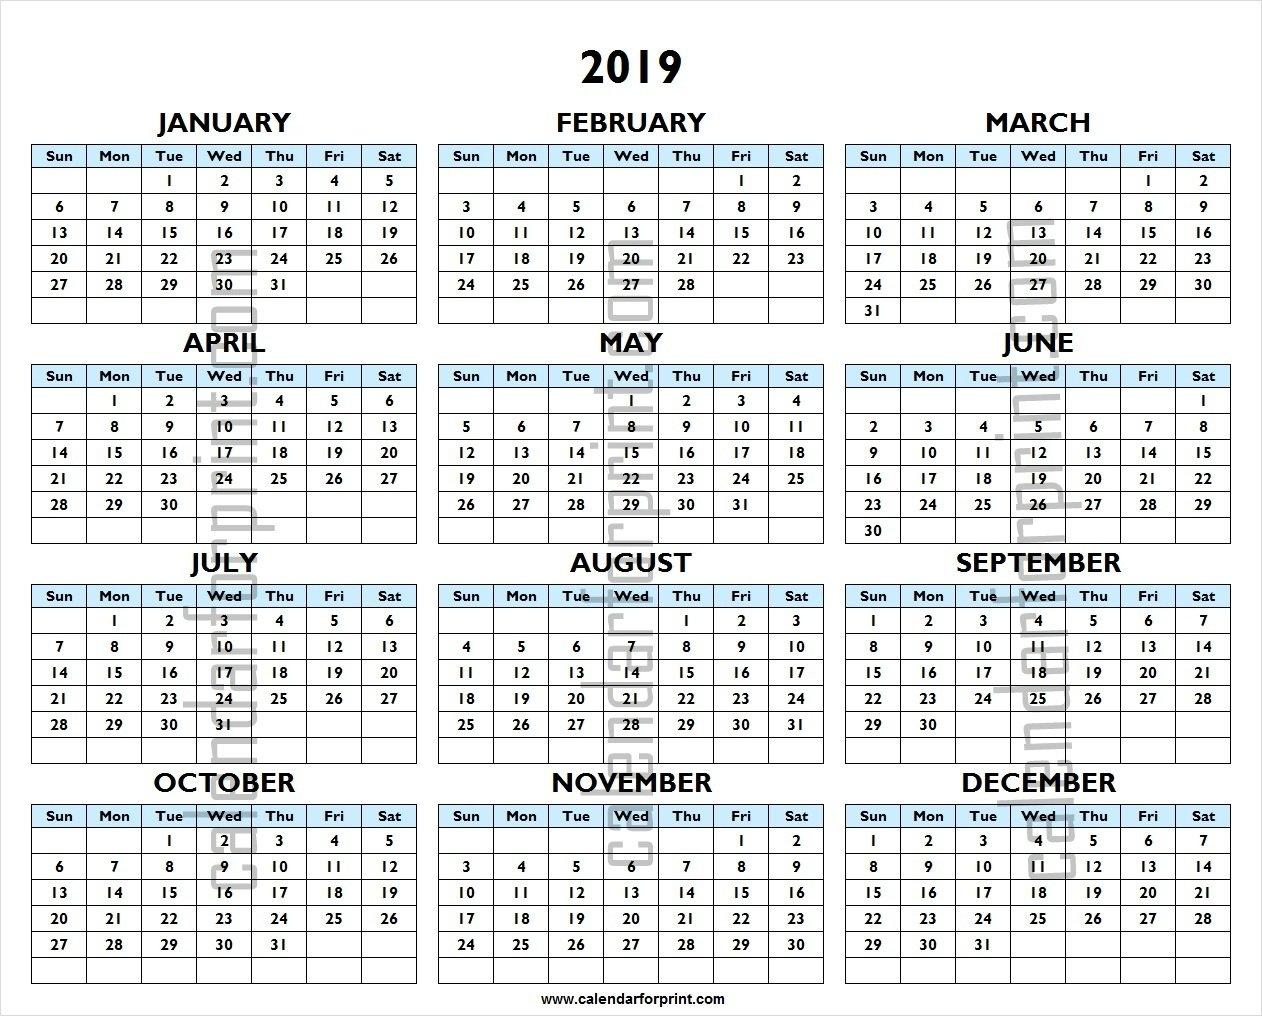 Printable 2019 Calendar | One Year 2019 Excel Template 1 Year Calendar 2019